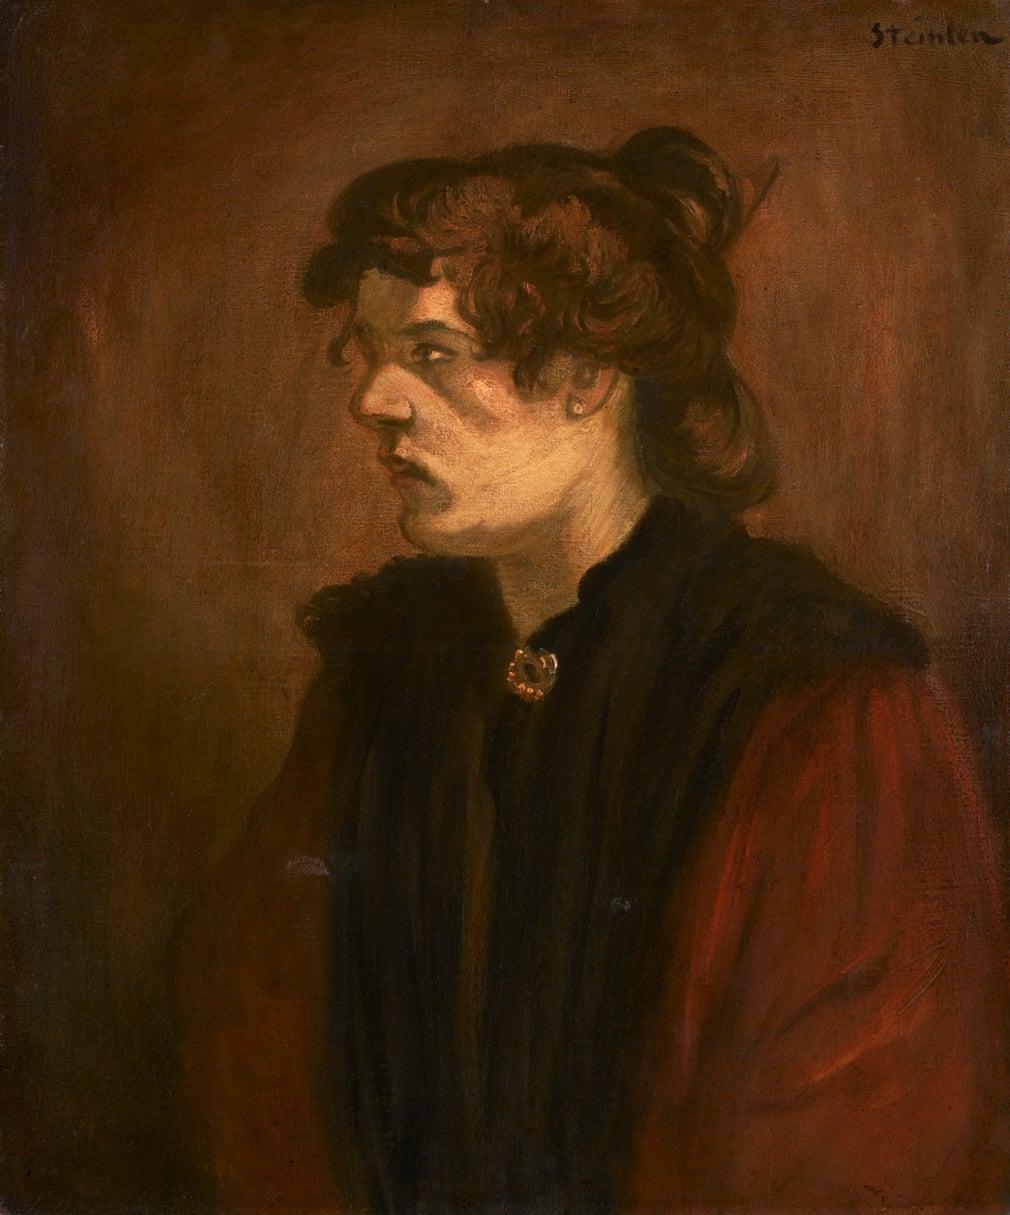 Théophile Alexandre Steinlen: La Pierreuse, 1905